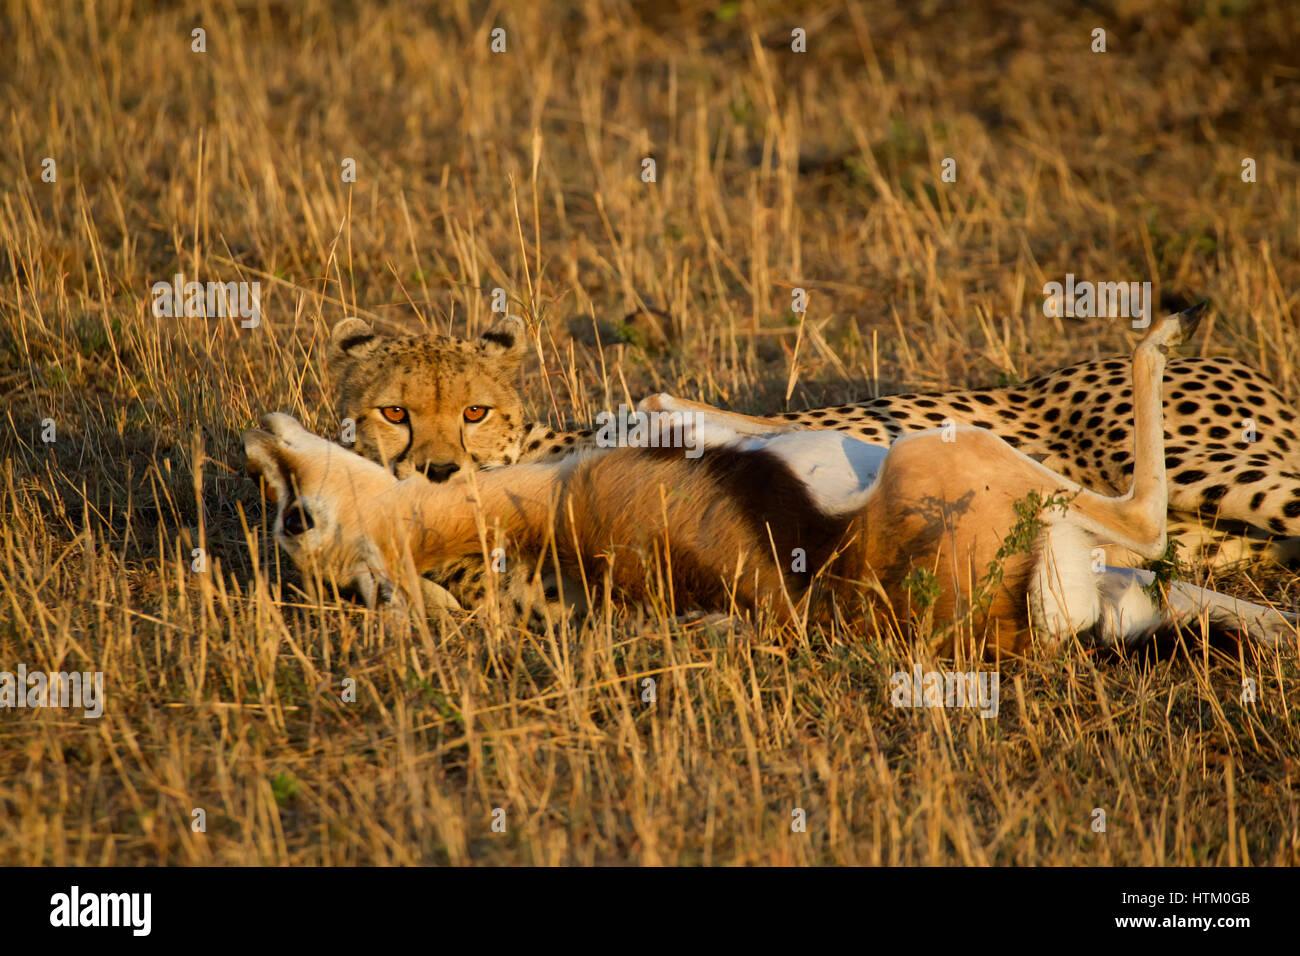 Guepardo (Acinonyx jubatus) con su matar, Reserva Nacional de Masai Mara, Kenia, África Oriental Foto de stock